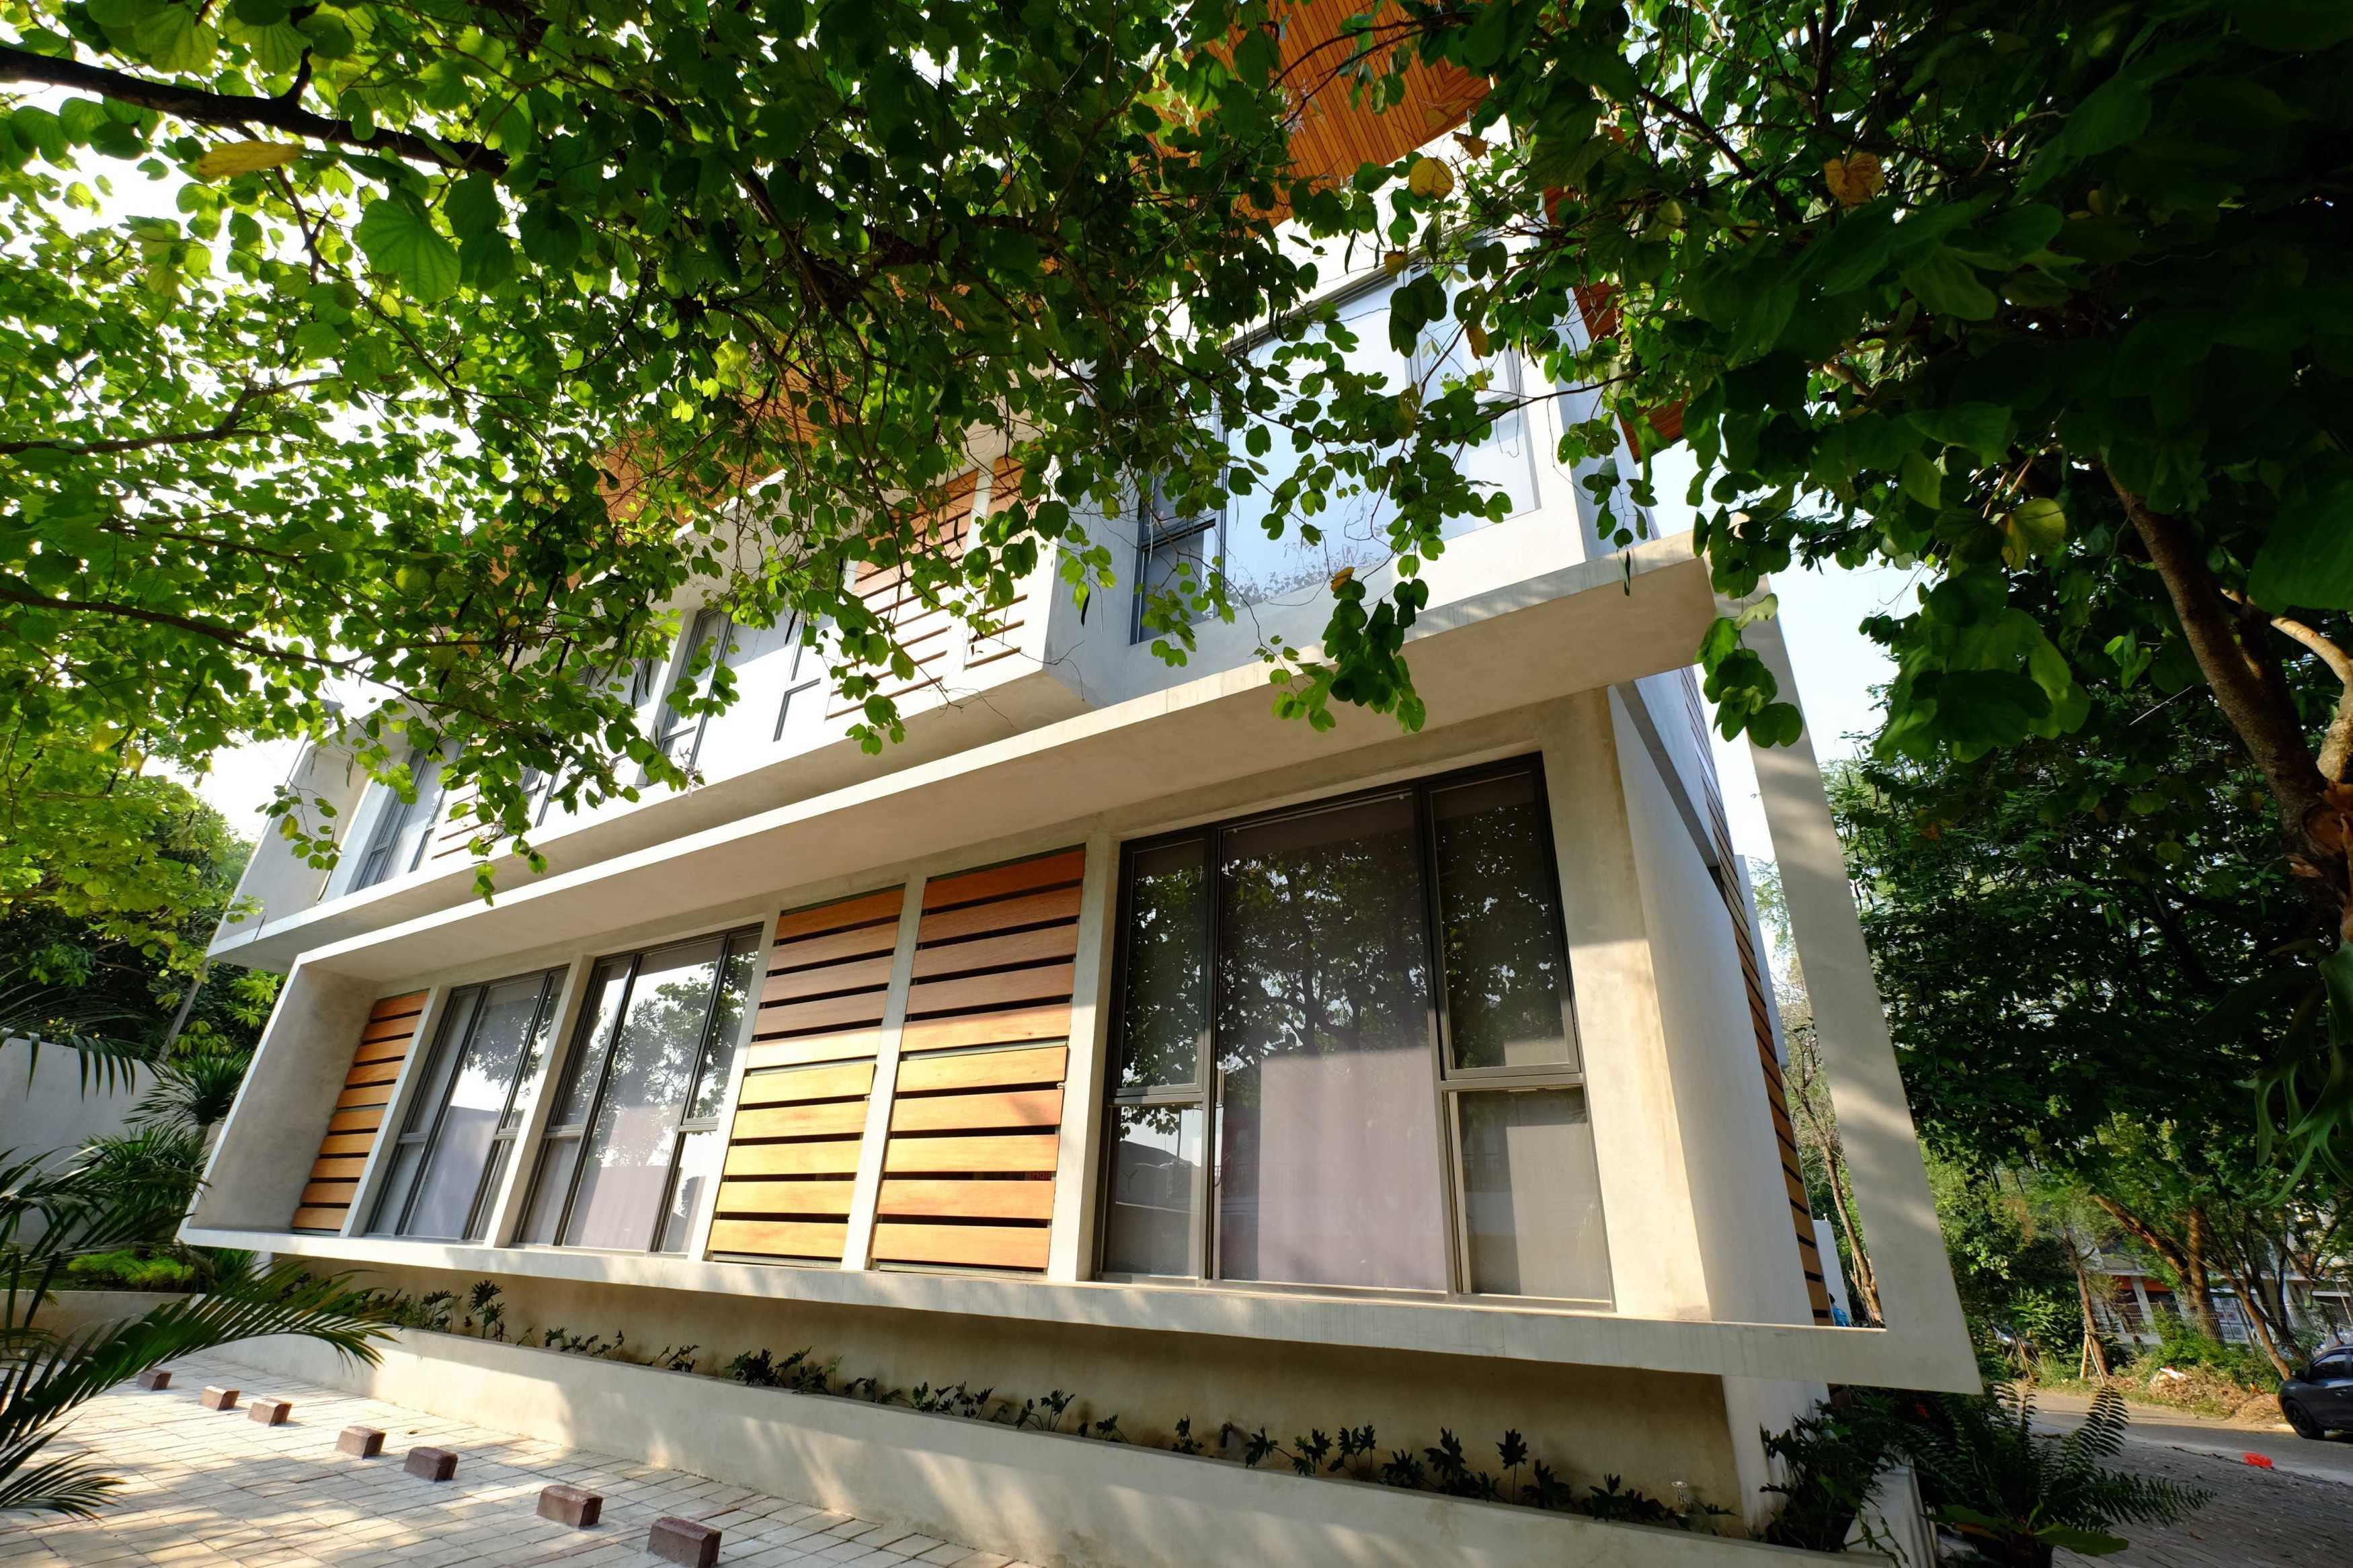 Gohte Architects The Lodge Lippo Karawaci, Binong, Kec. Curug, Tangerang, Banten, Indonesia Lippo Karawaci, Binong, Kec. Curug, Tangerang, Banten, Indonesia Gohte-Architects-The-Lodge   96608